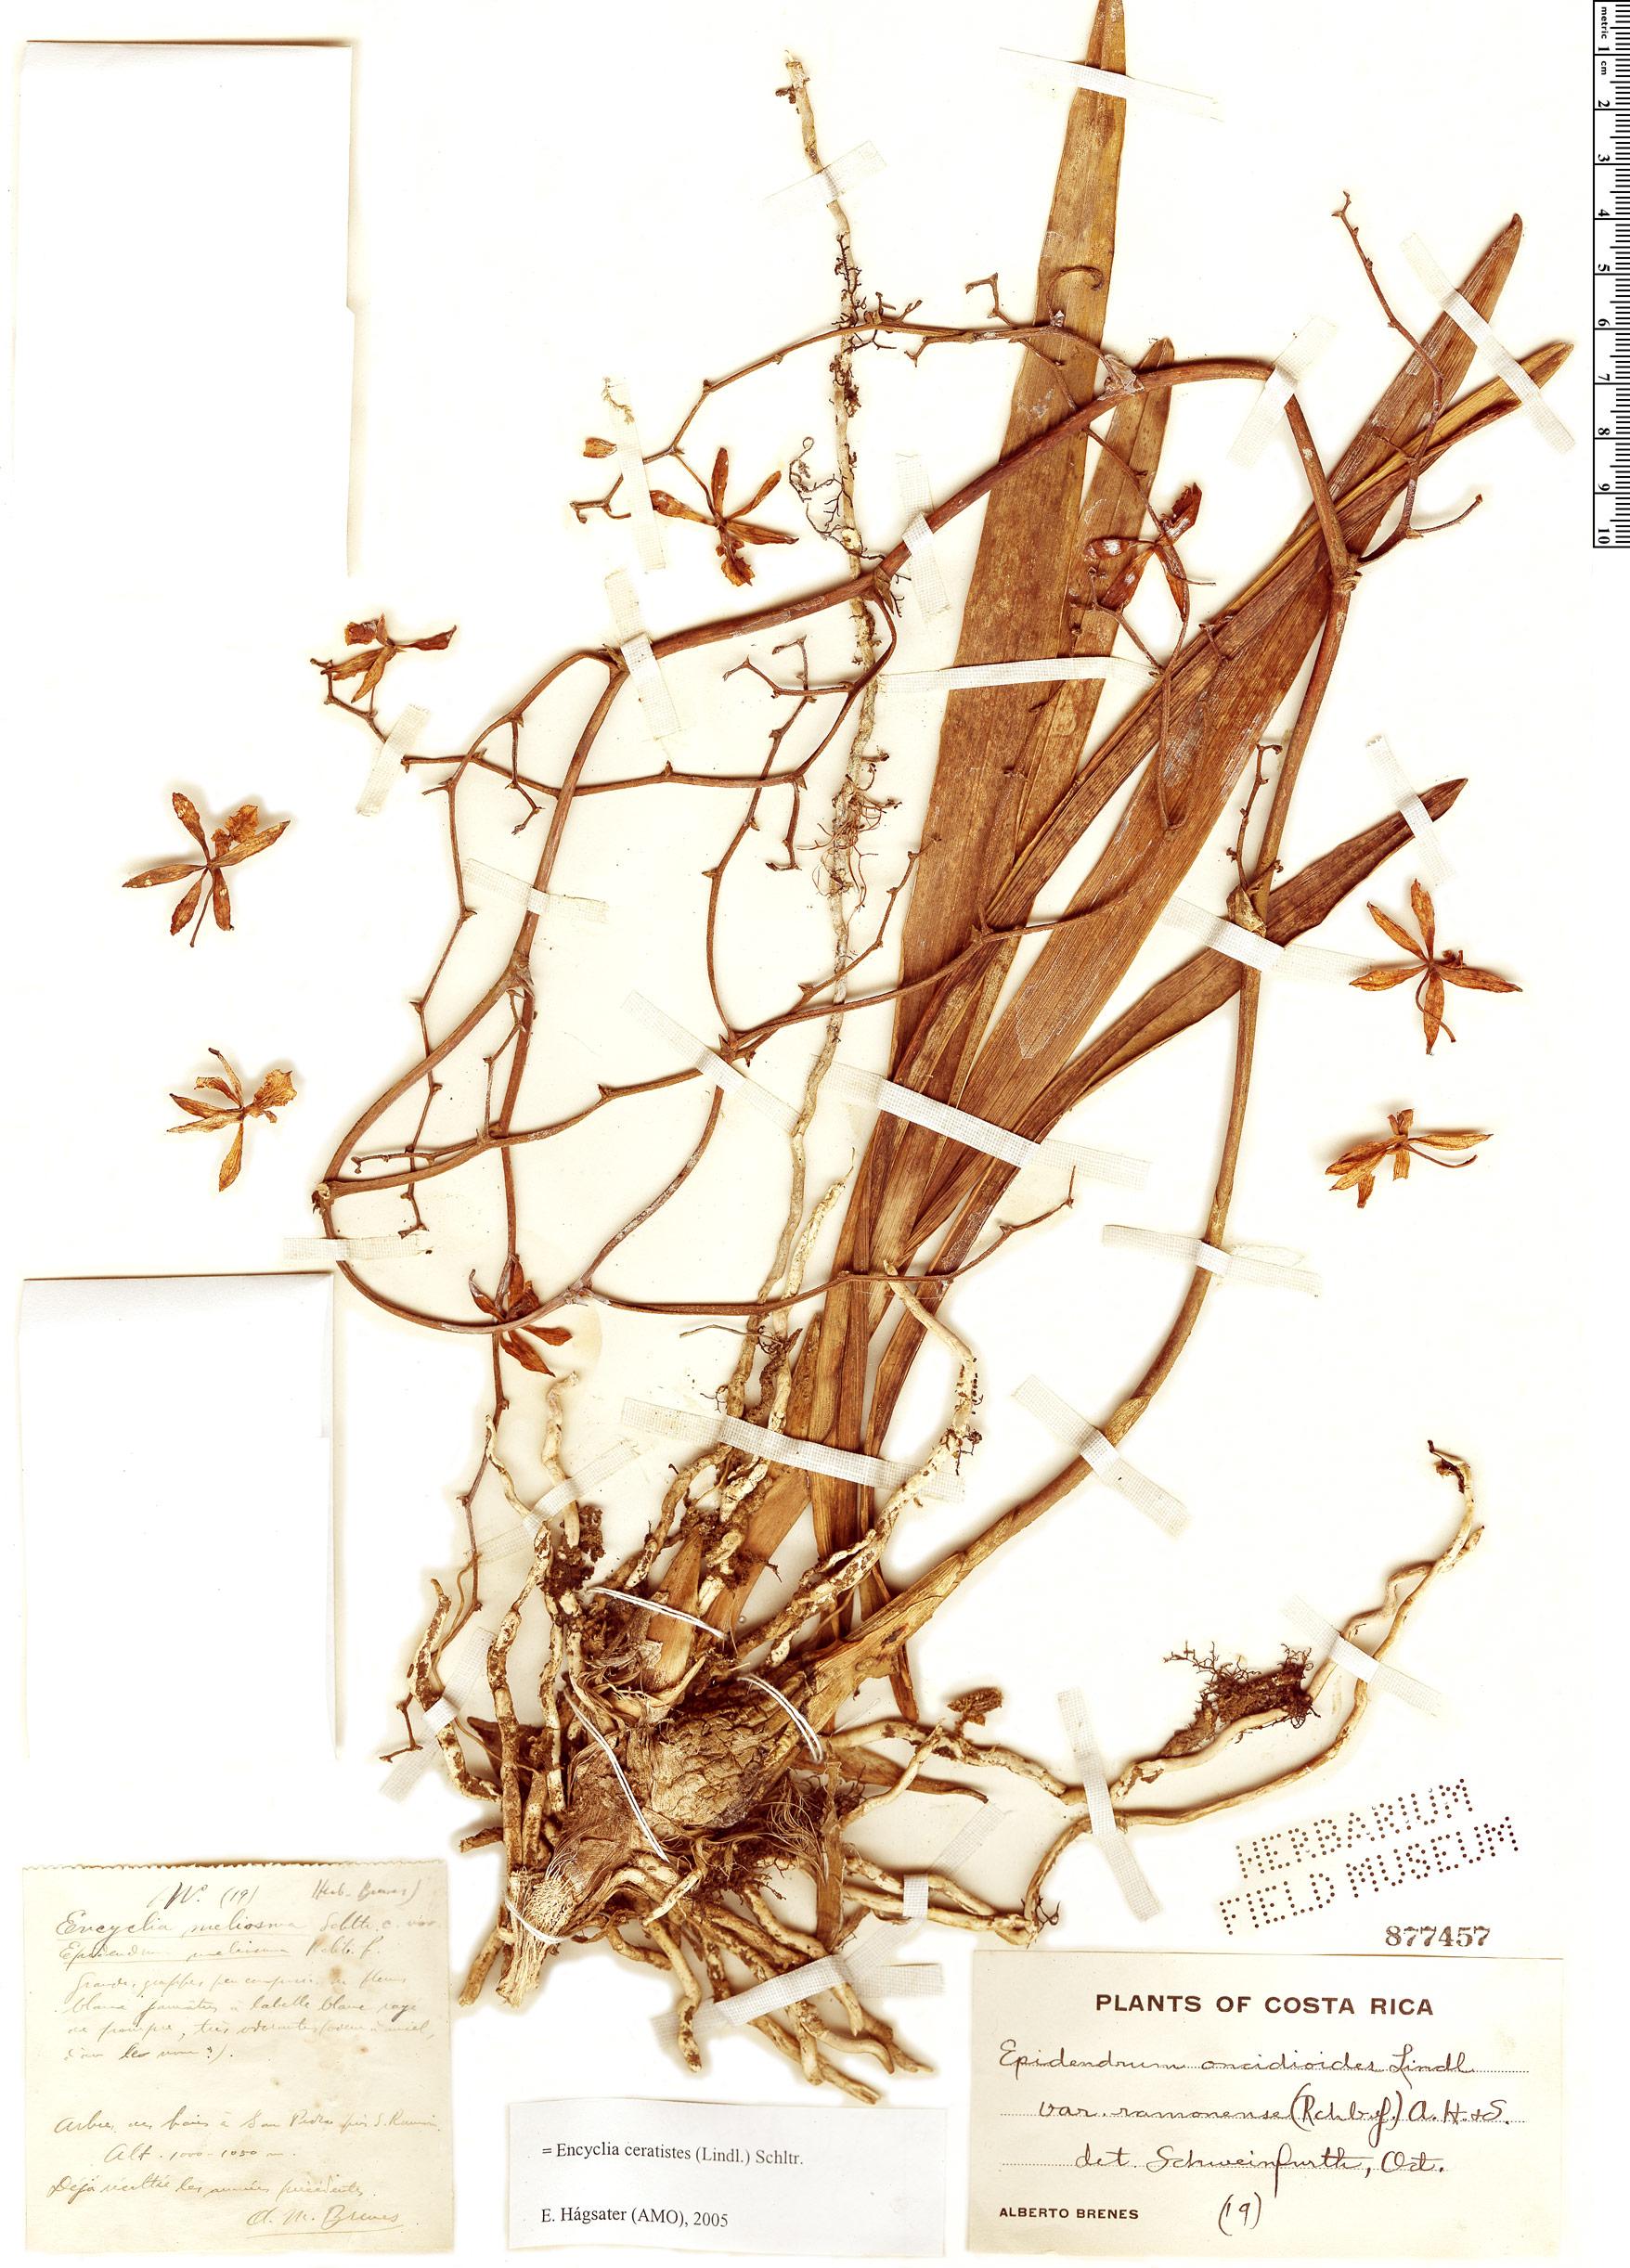 Specimen: Encyclia ceratistes